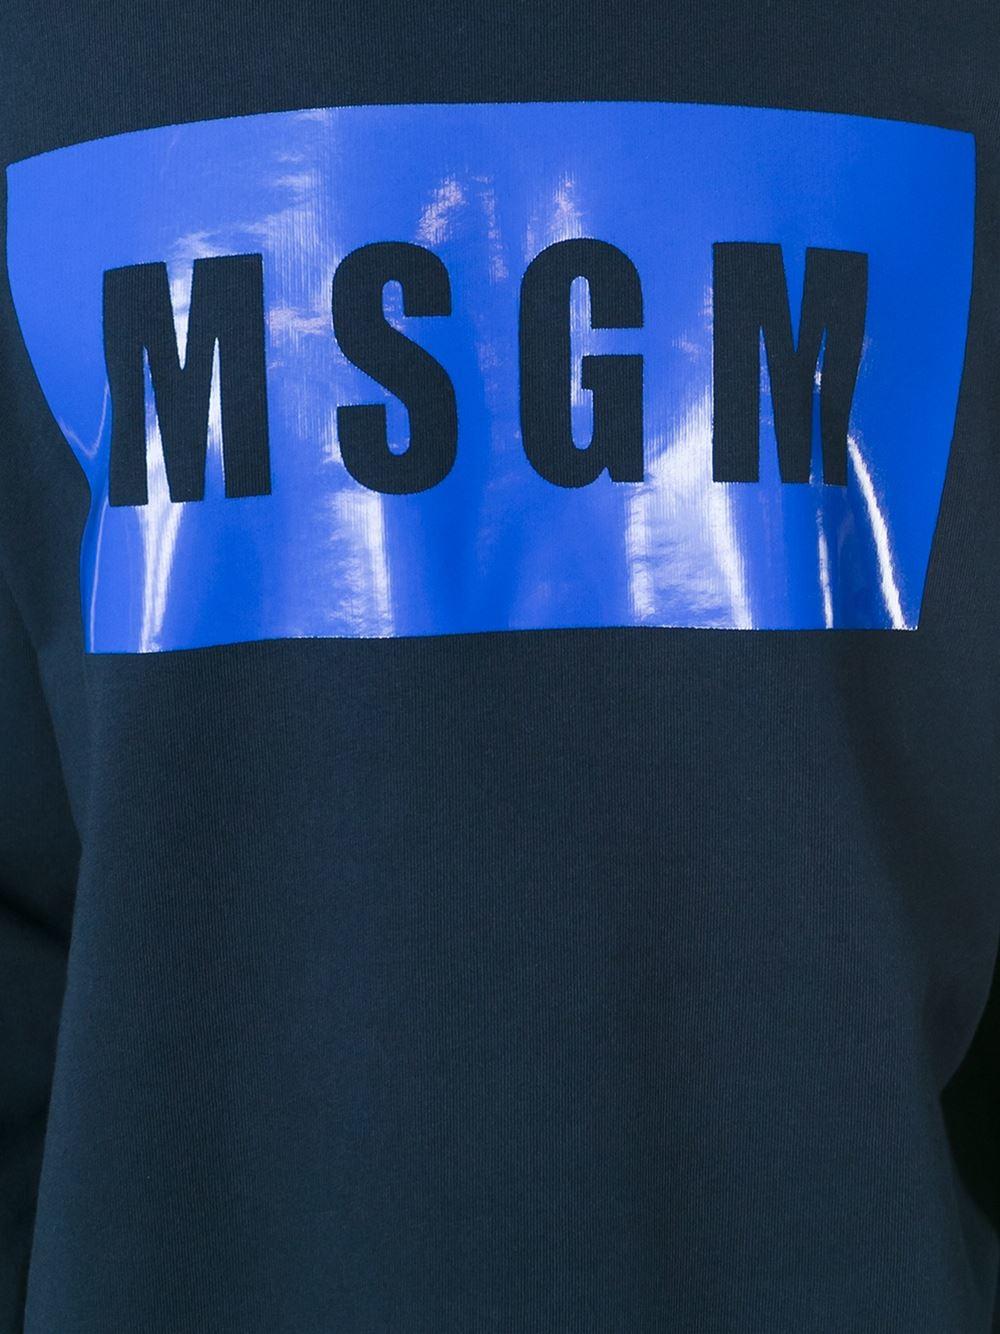 Msgm Blue Sweatshirt In Blue For Men Lyst